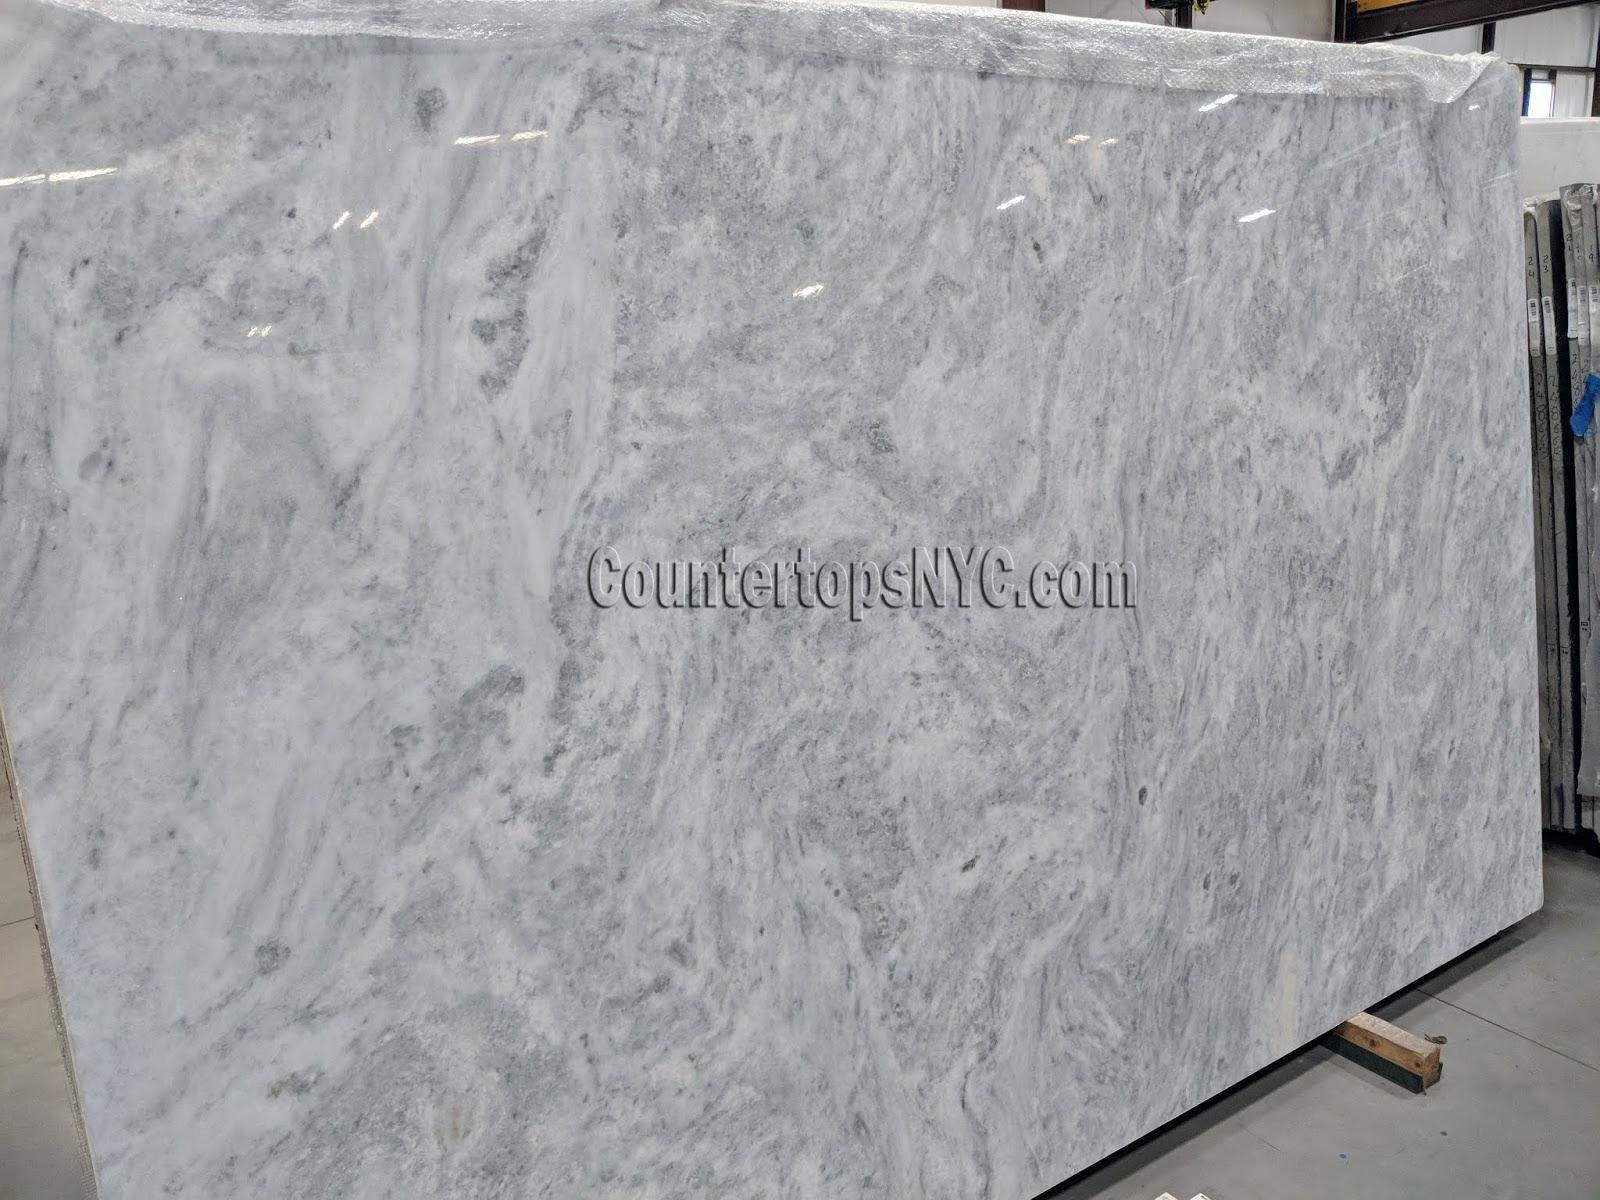 Countertops NYC: Quartzite Kitchen Countertops Slabs